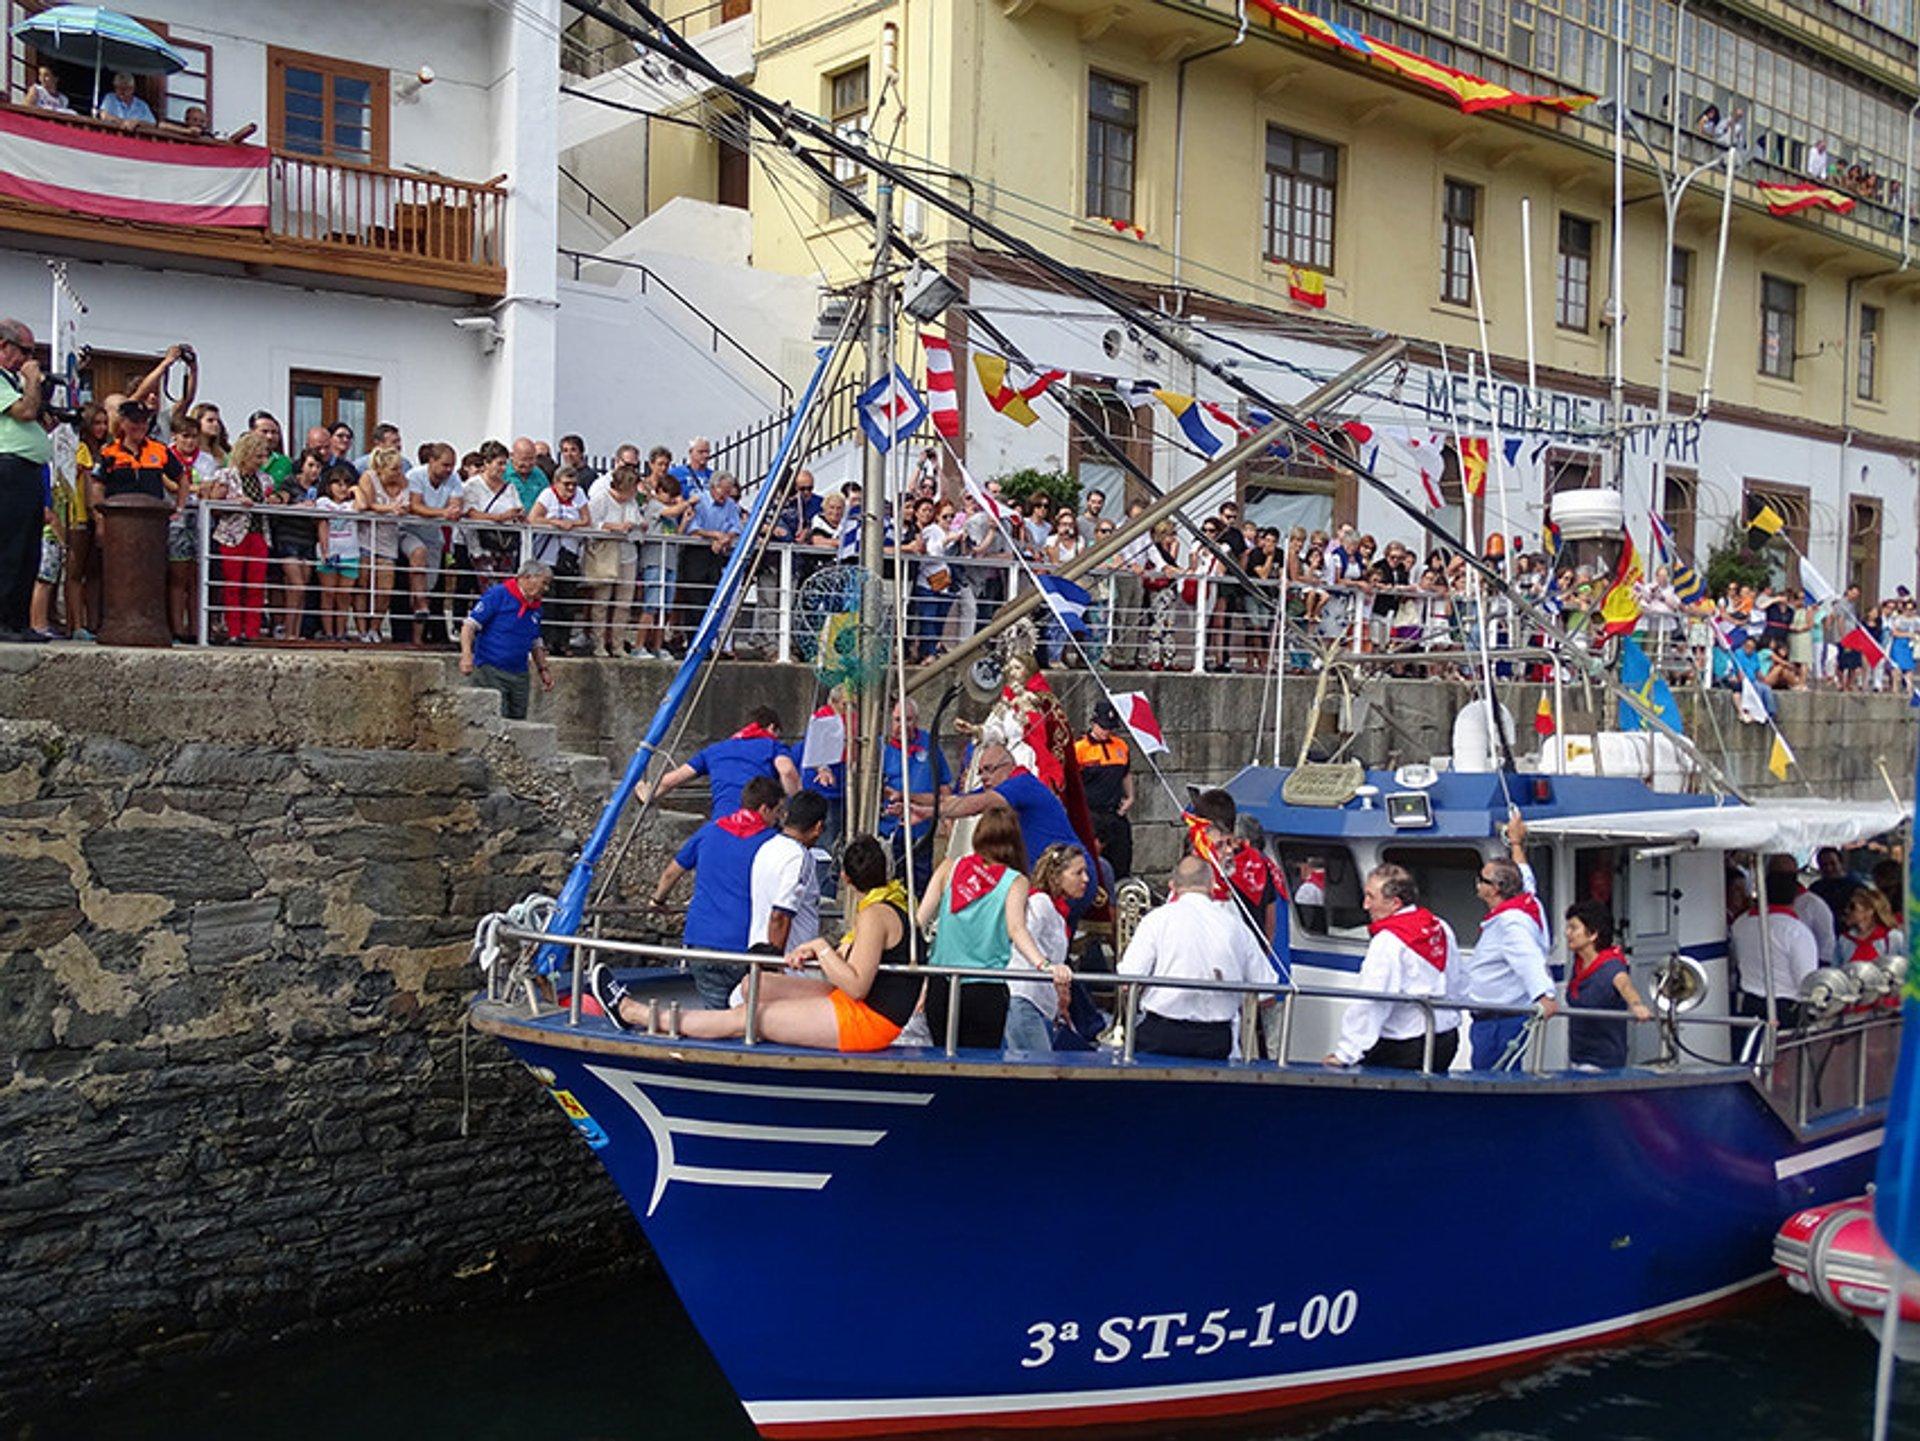 Luarca Maritime Procession of Virgen del Rosario in Spain 2019 - Best Time